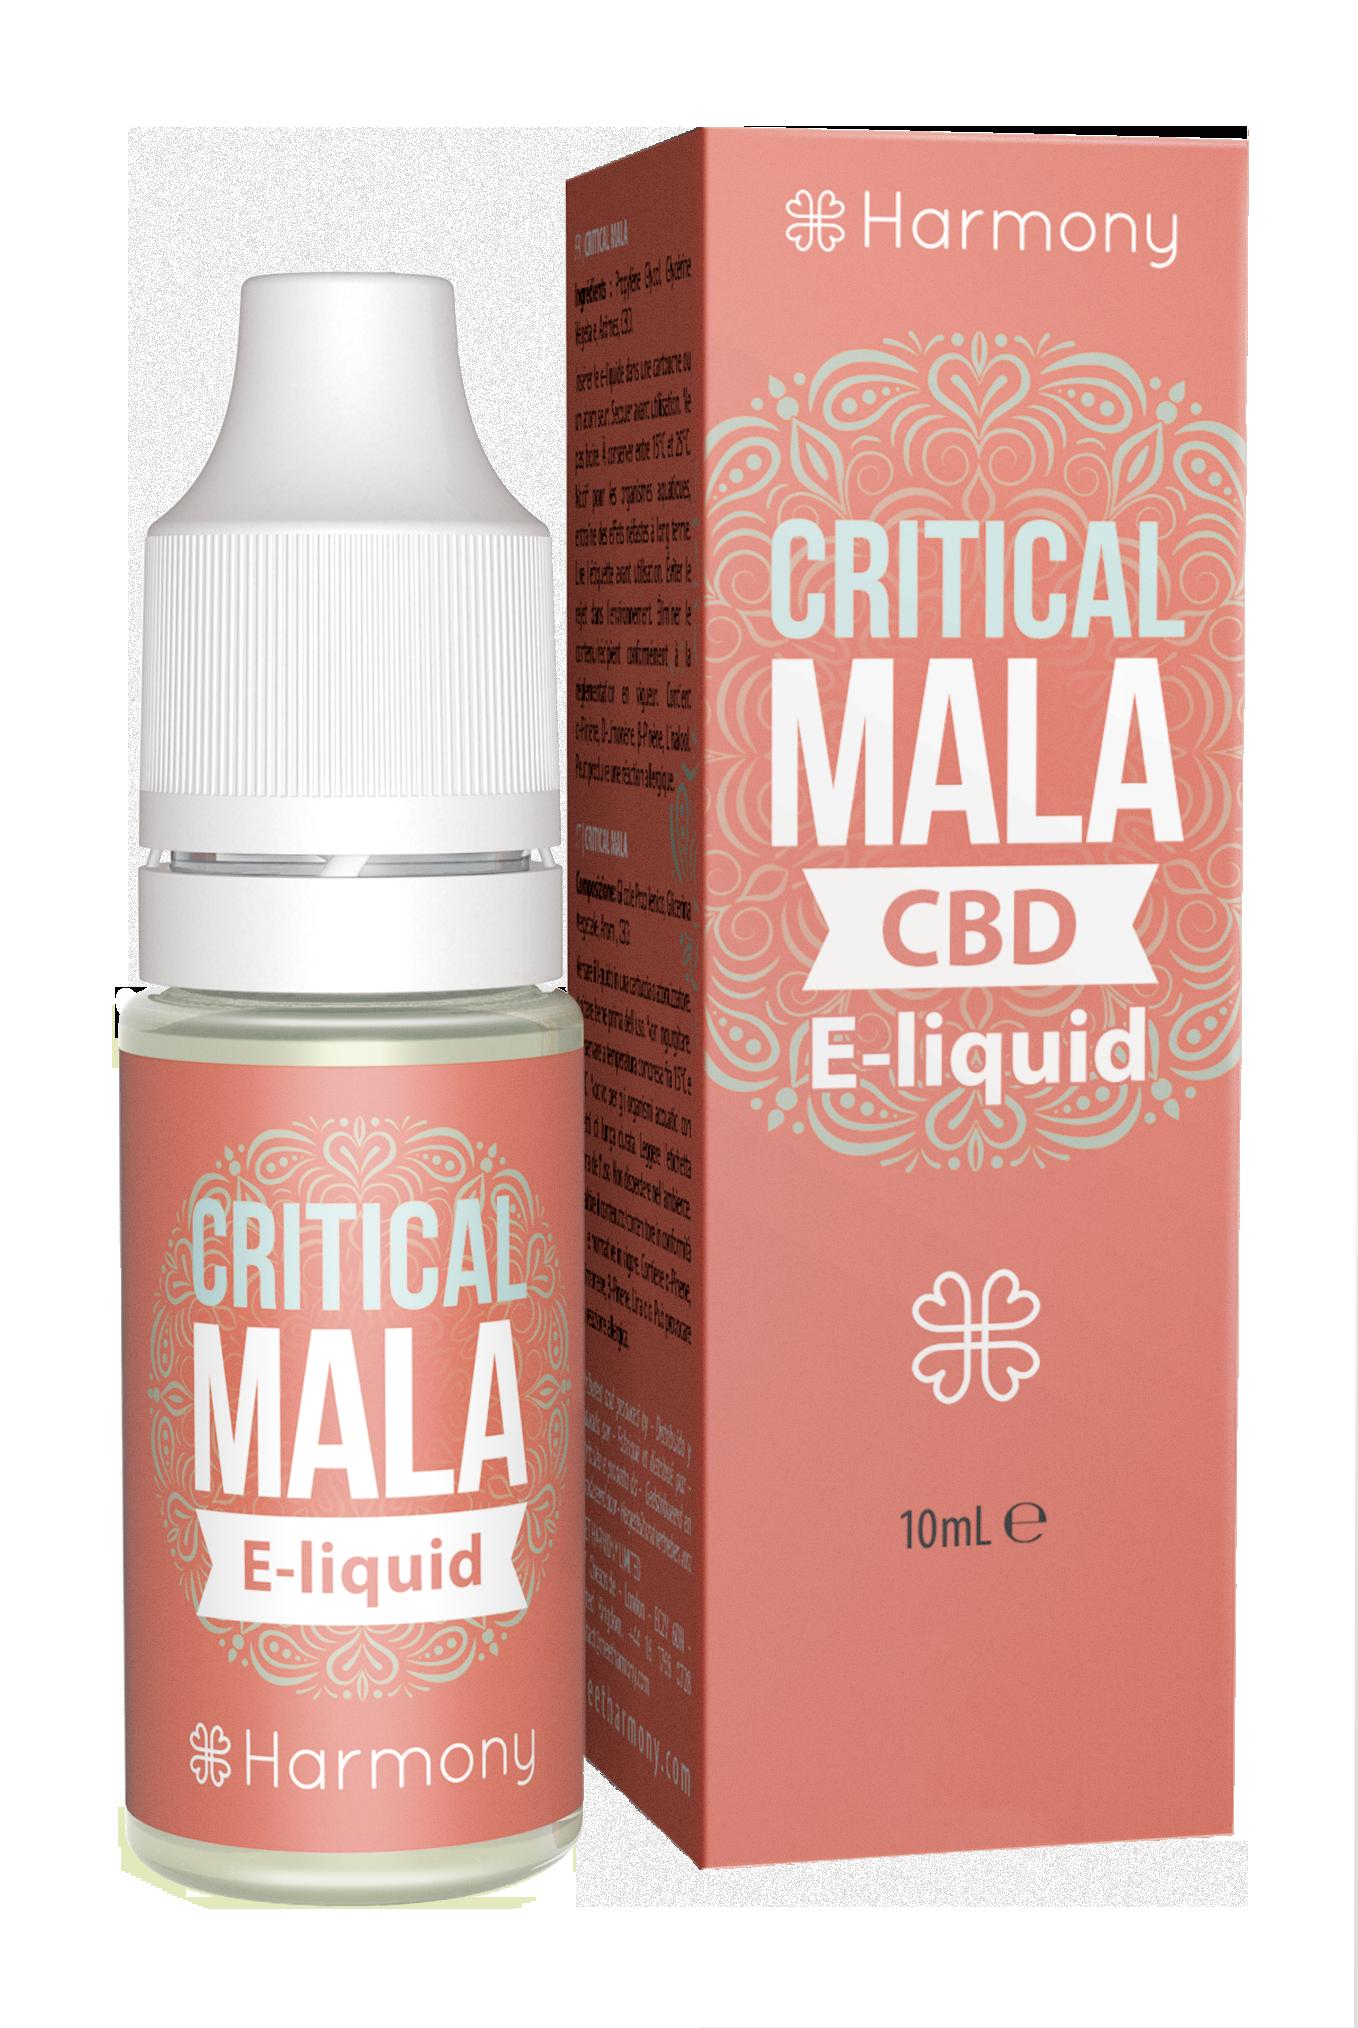 Harmony CBD E-Liquid - 30mg CBD - Geschmackssorte Critical Mala - 10ml